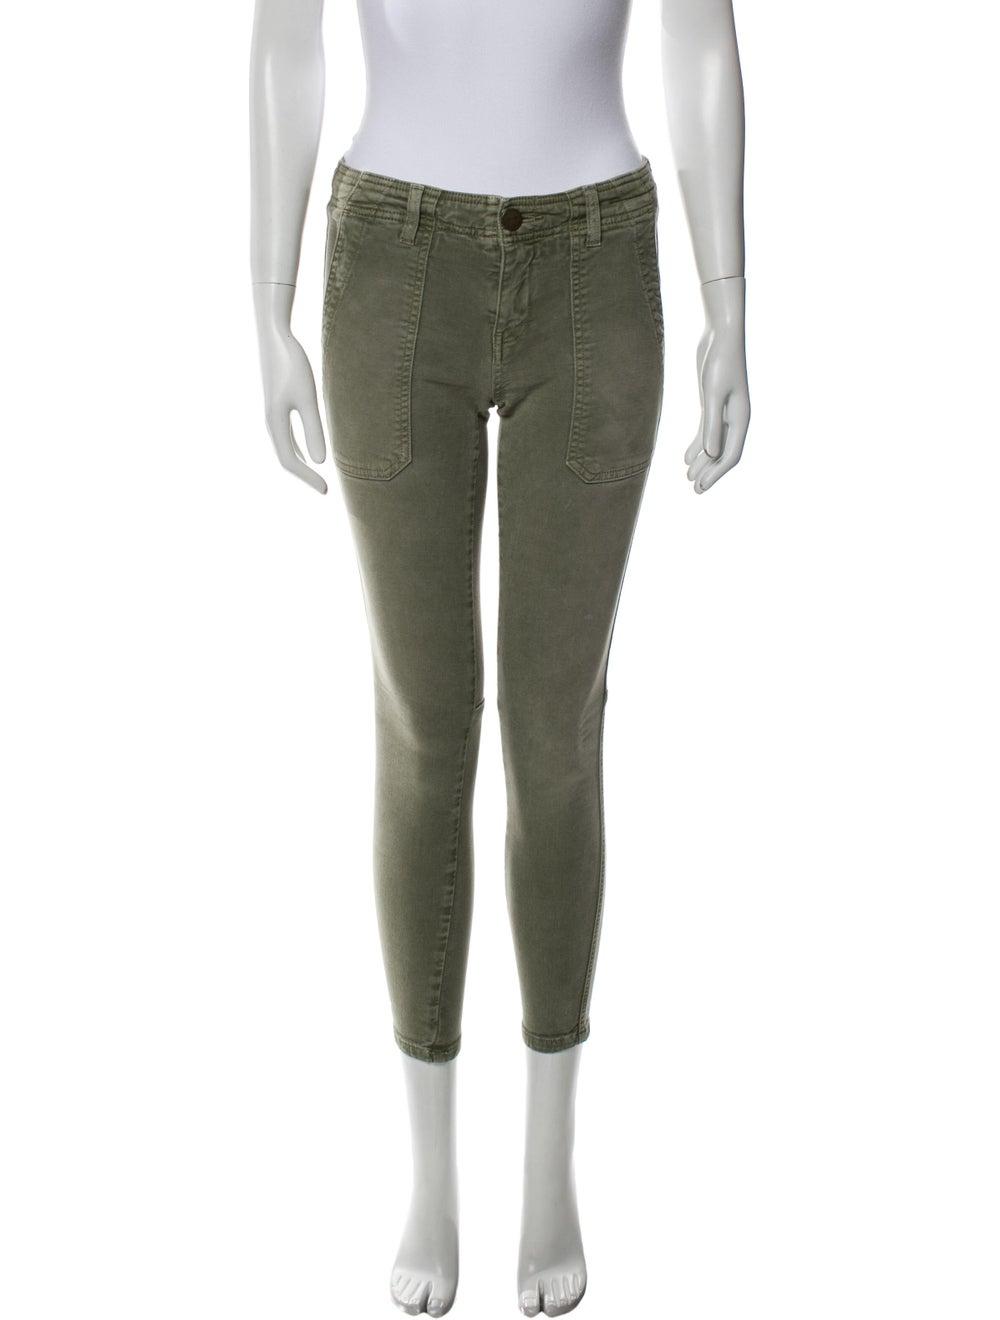 Current/Elliott Skinny Leg Pants Green - image 1